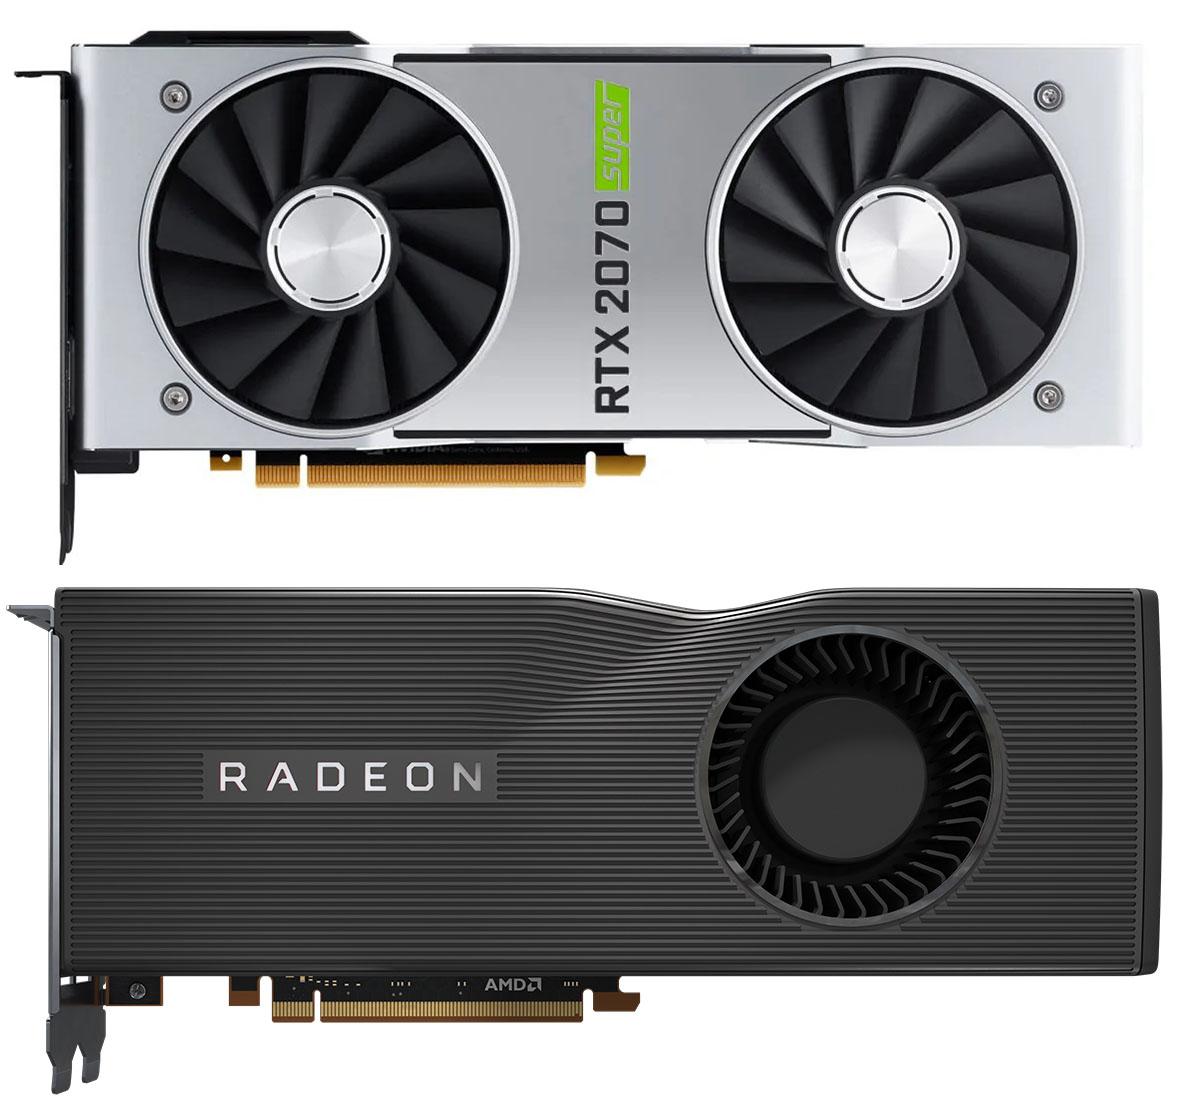 QOTW: Your next gaming GPU - Nvidia or AMD? - Graphics